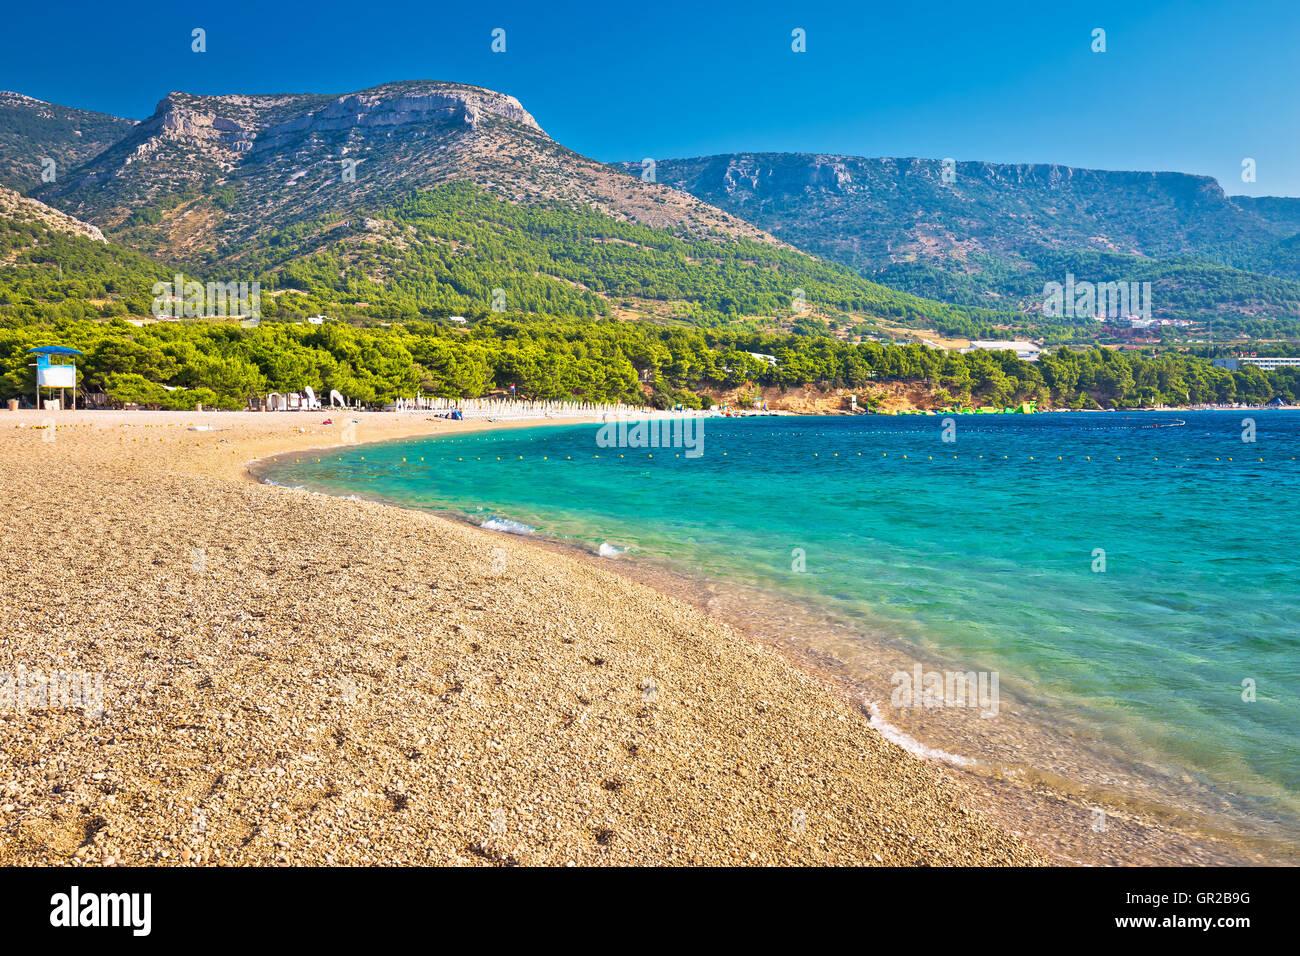 Zlatni Rat turquoise beach in Bol on Brac island, Dalmatia, Croatia - Stock Image